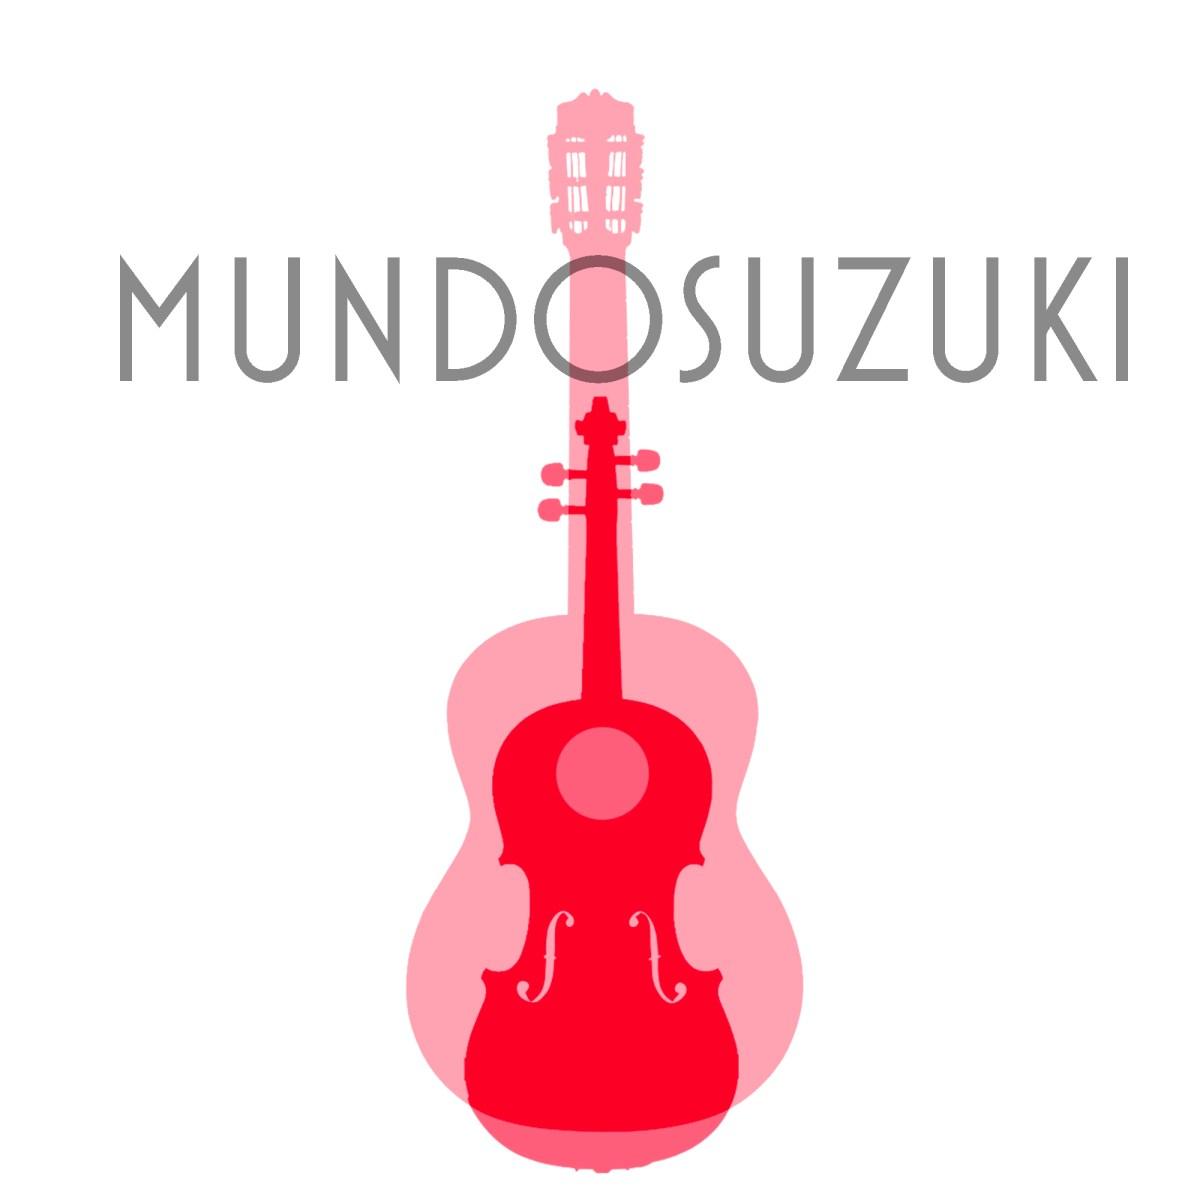 Mundo Suzuki